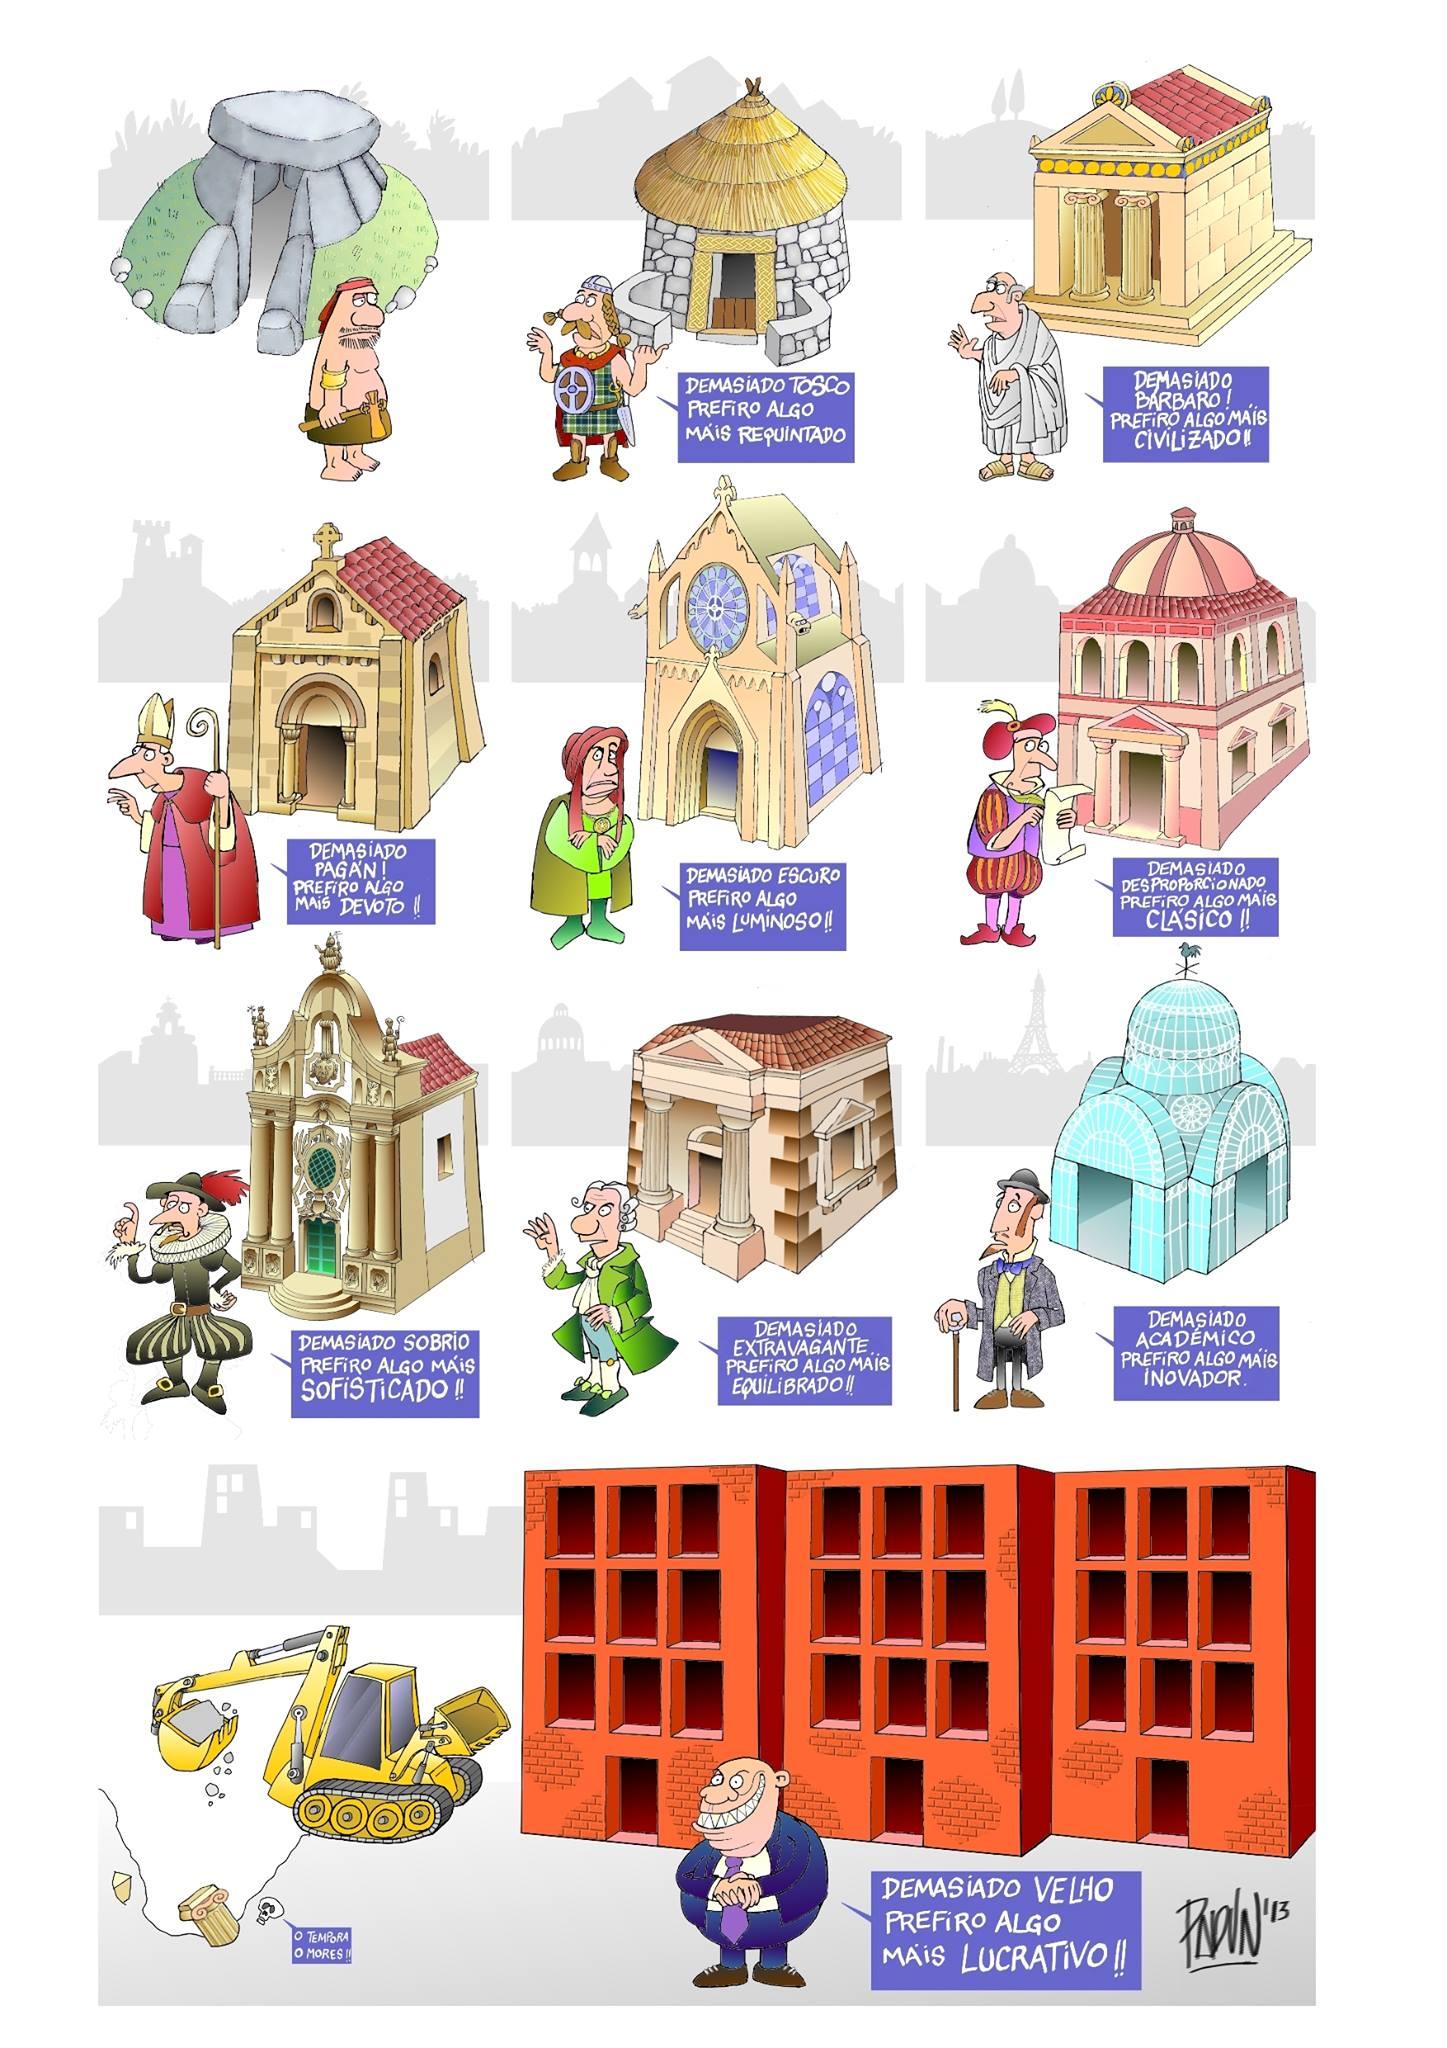 La evoluci n de la arquitectura pedacicosarquitectonicos for Todo acerca de la arquitectura